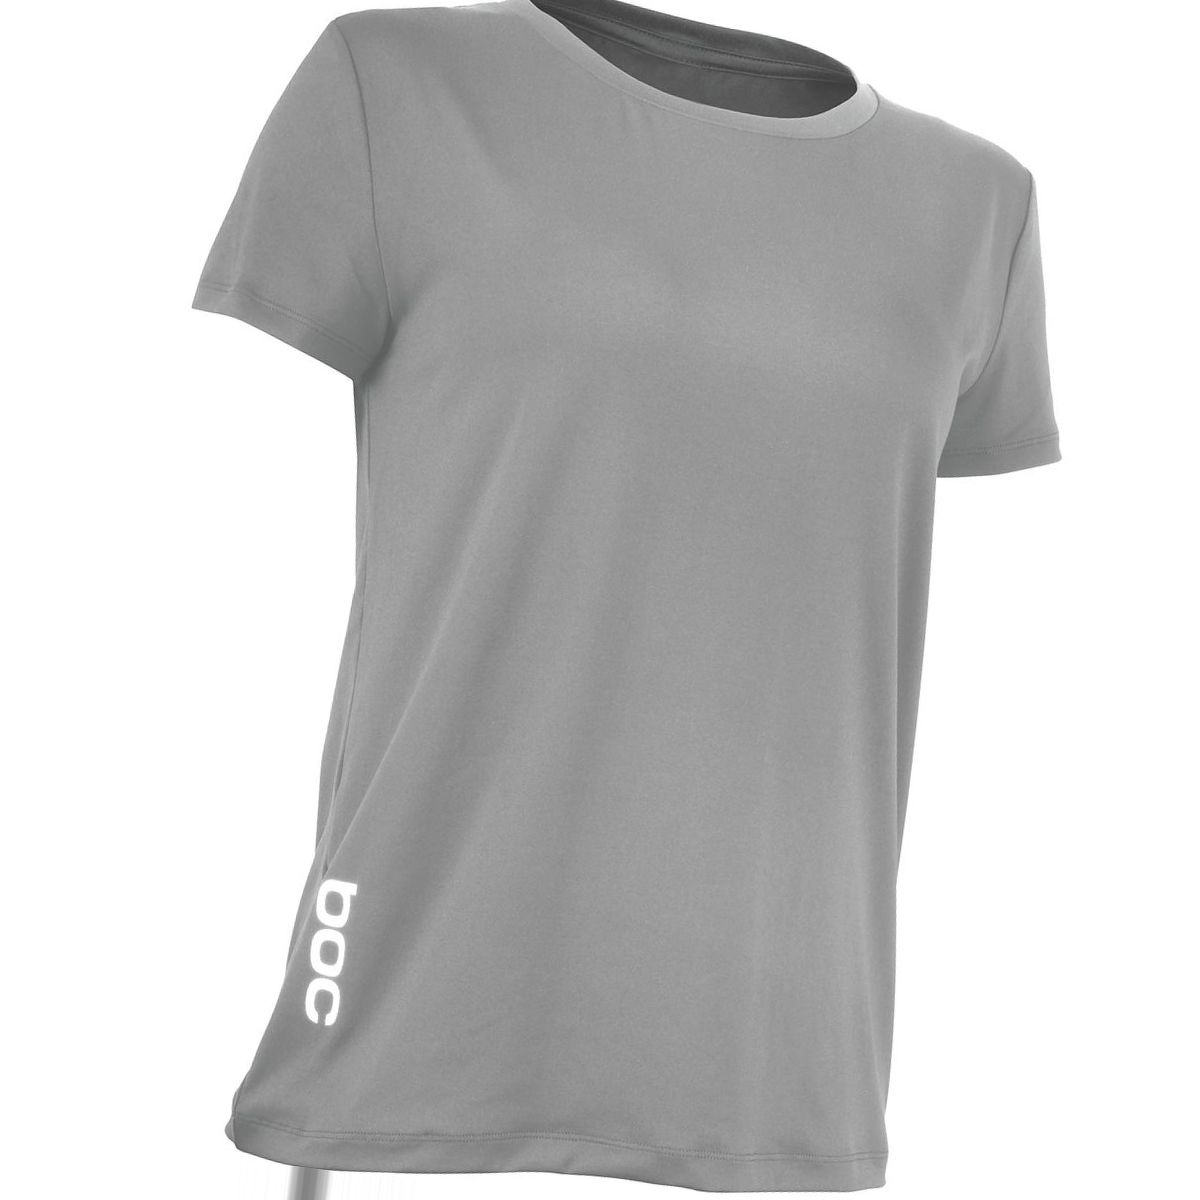 POC Resistance Enduro Light T-Shirt - Women's